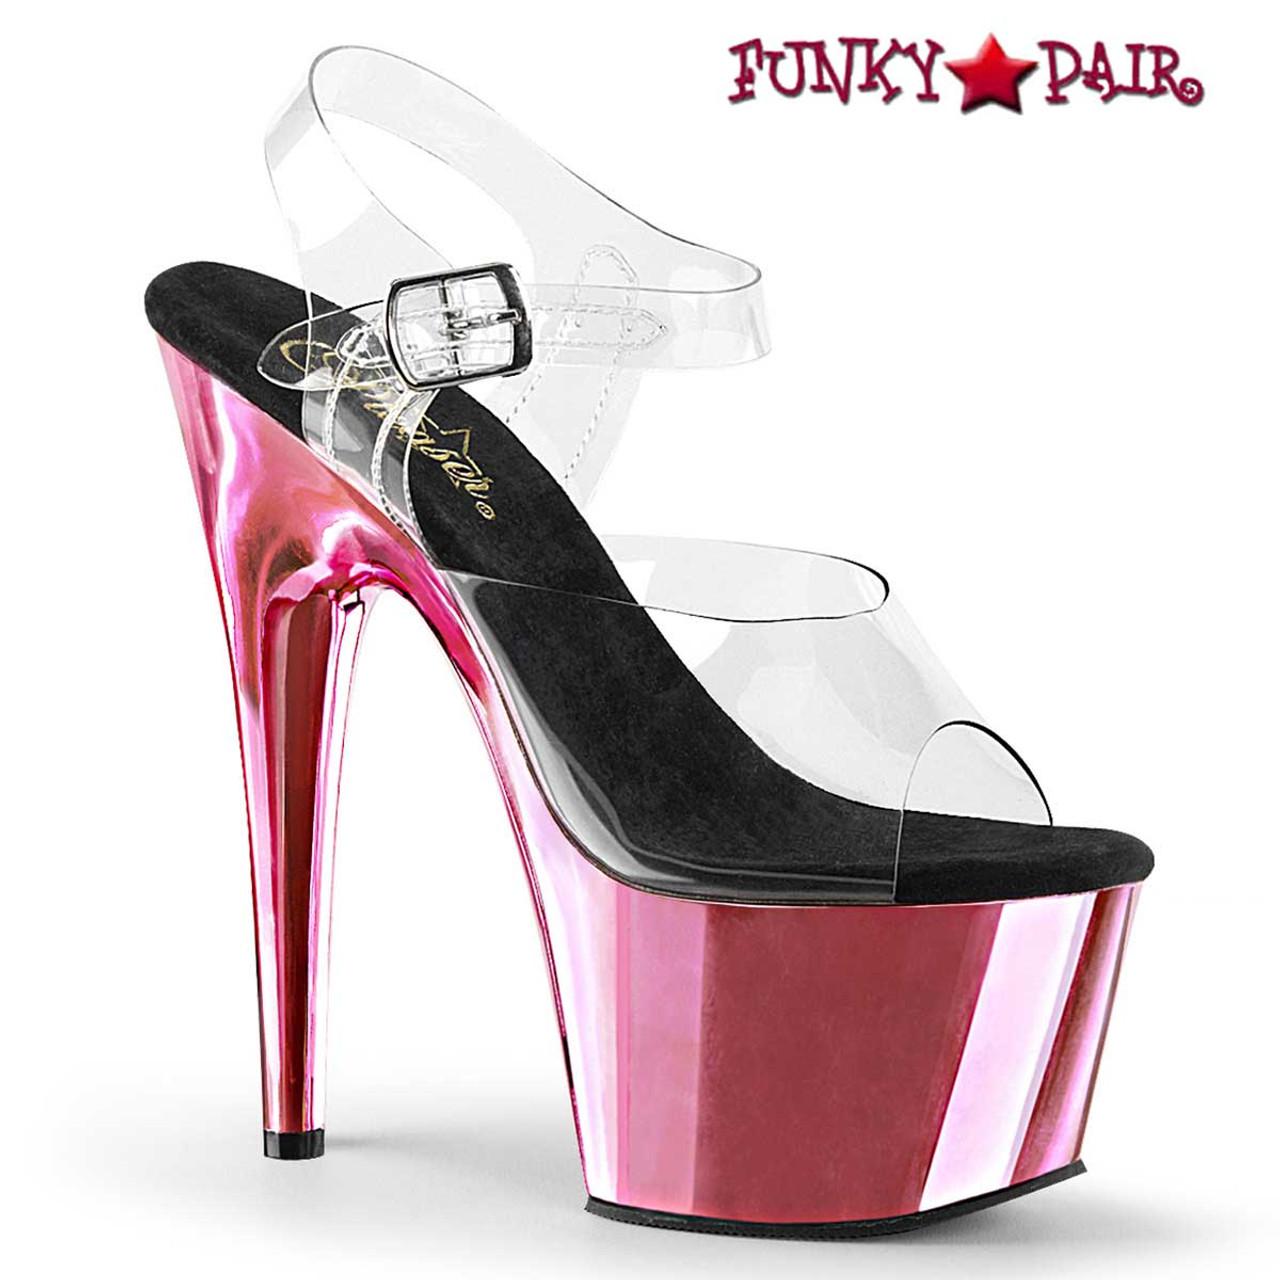 Pleaser High Heel Clear Ankle Strap Sandal Platform Shoes Adore 708uv Neon Pink 8